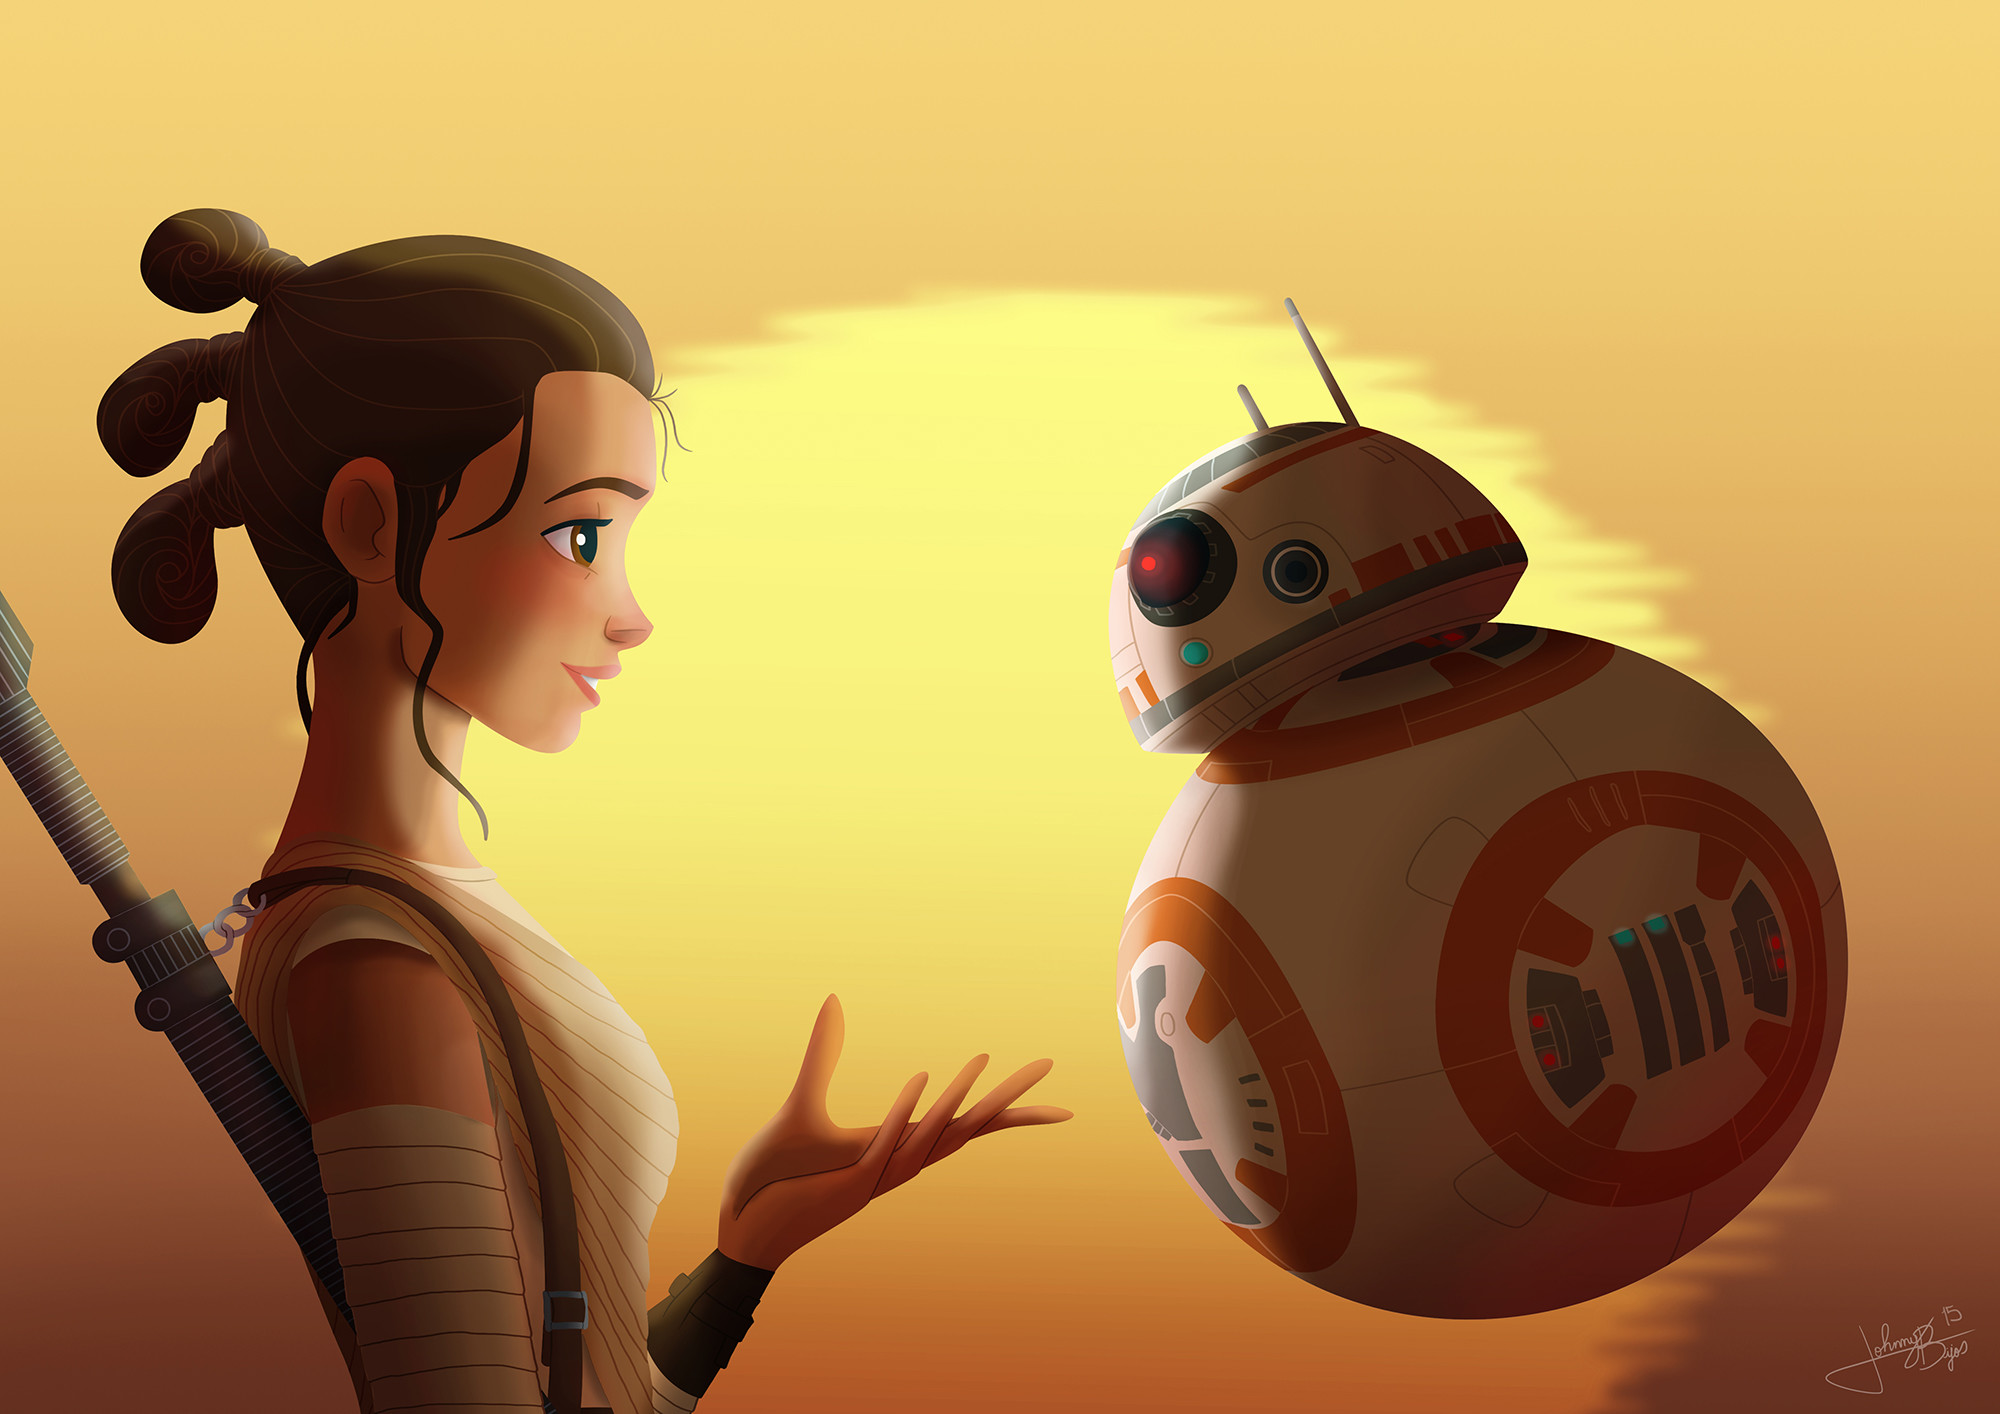 Star Wars Episode VII: The Force Awakens Background